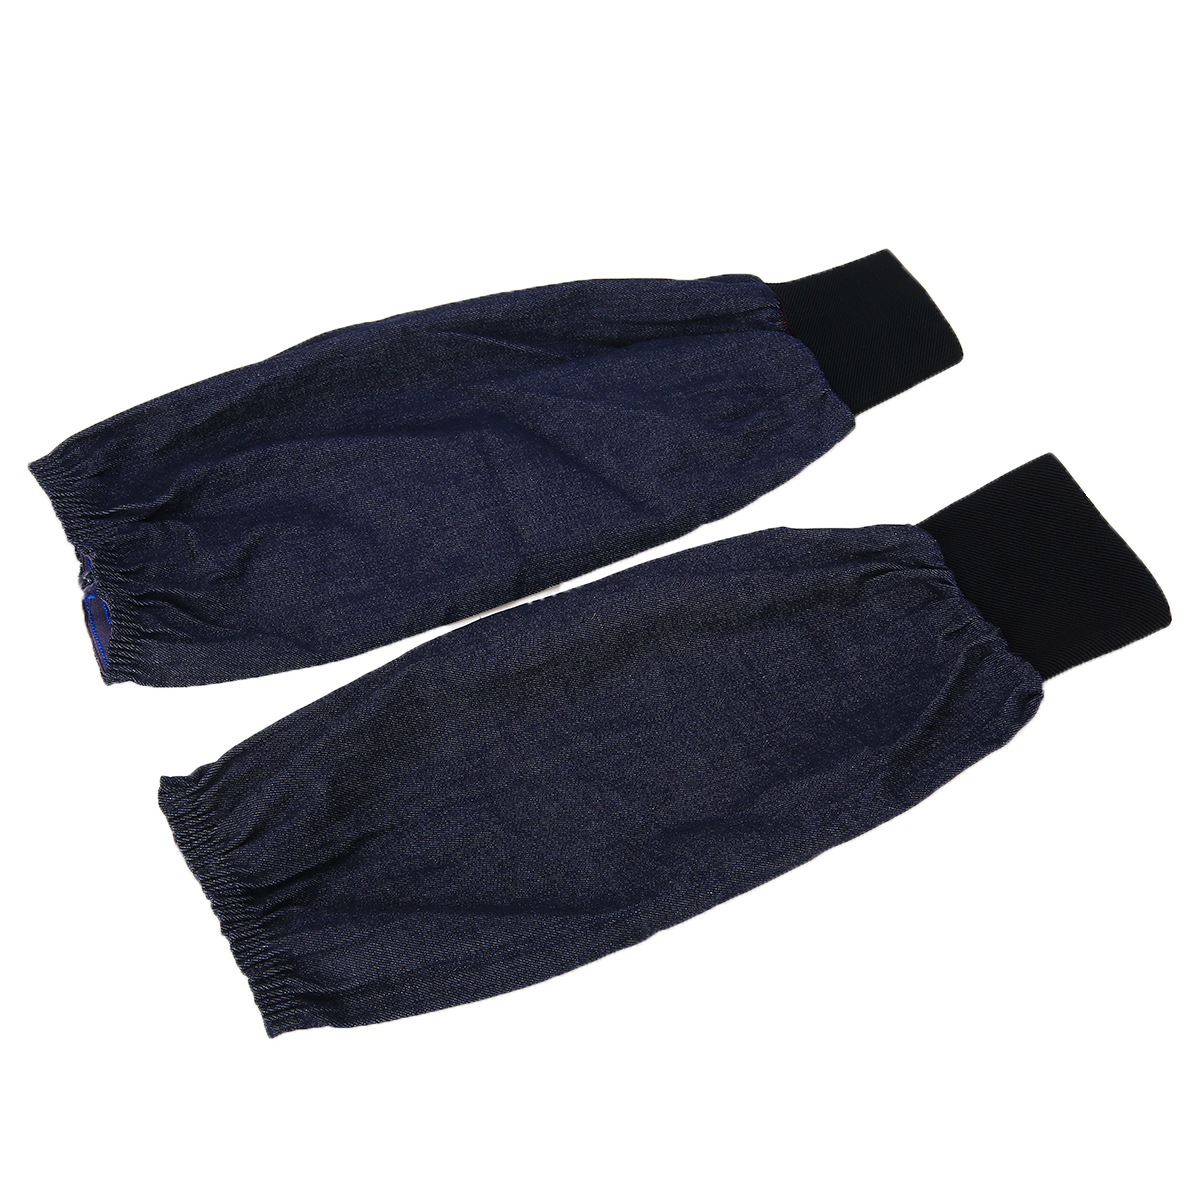 1 Pair Portable Welding Arm Sleeves Denim Working Sleeves Cut Resistant Heat Protection Welder Hand Arm Protective Sleeves